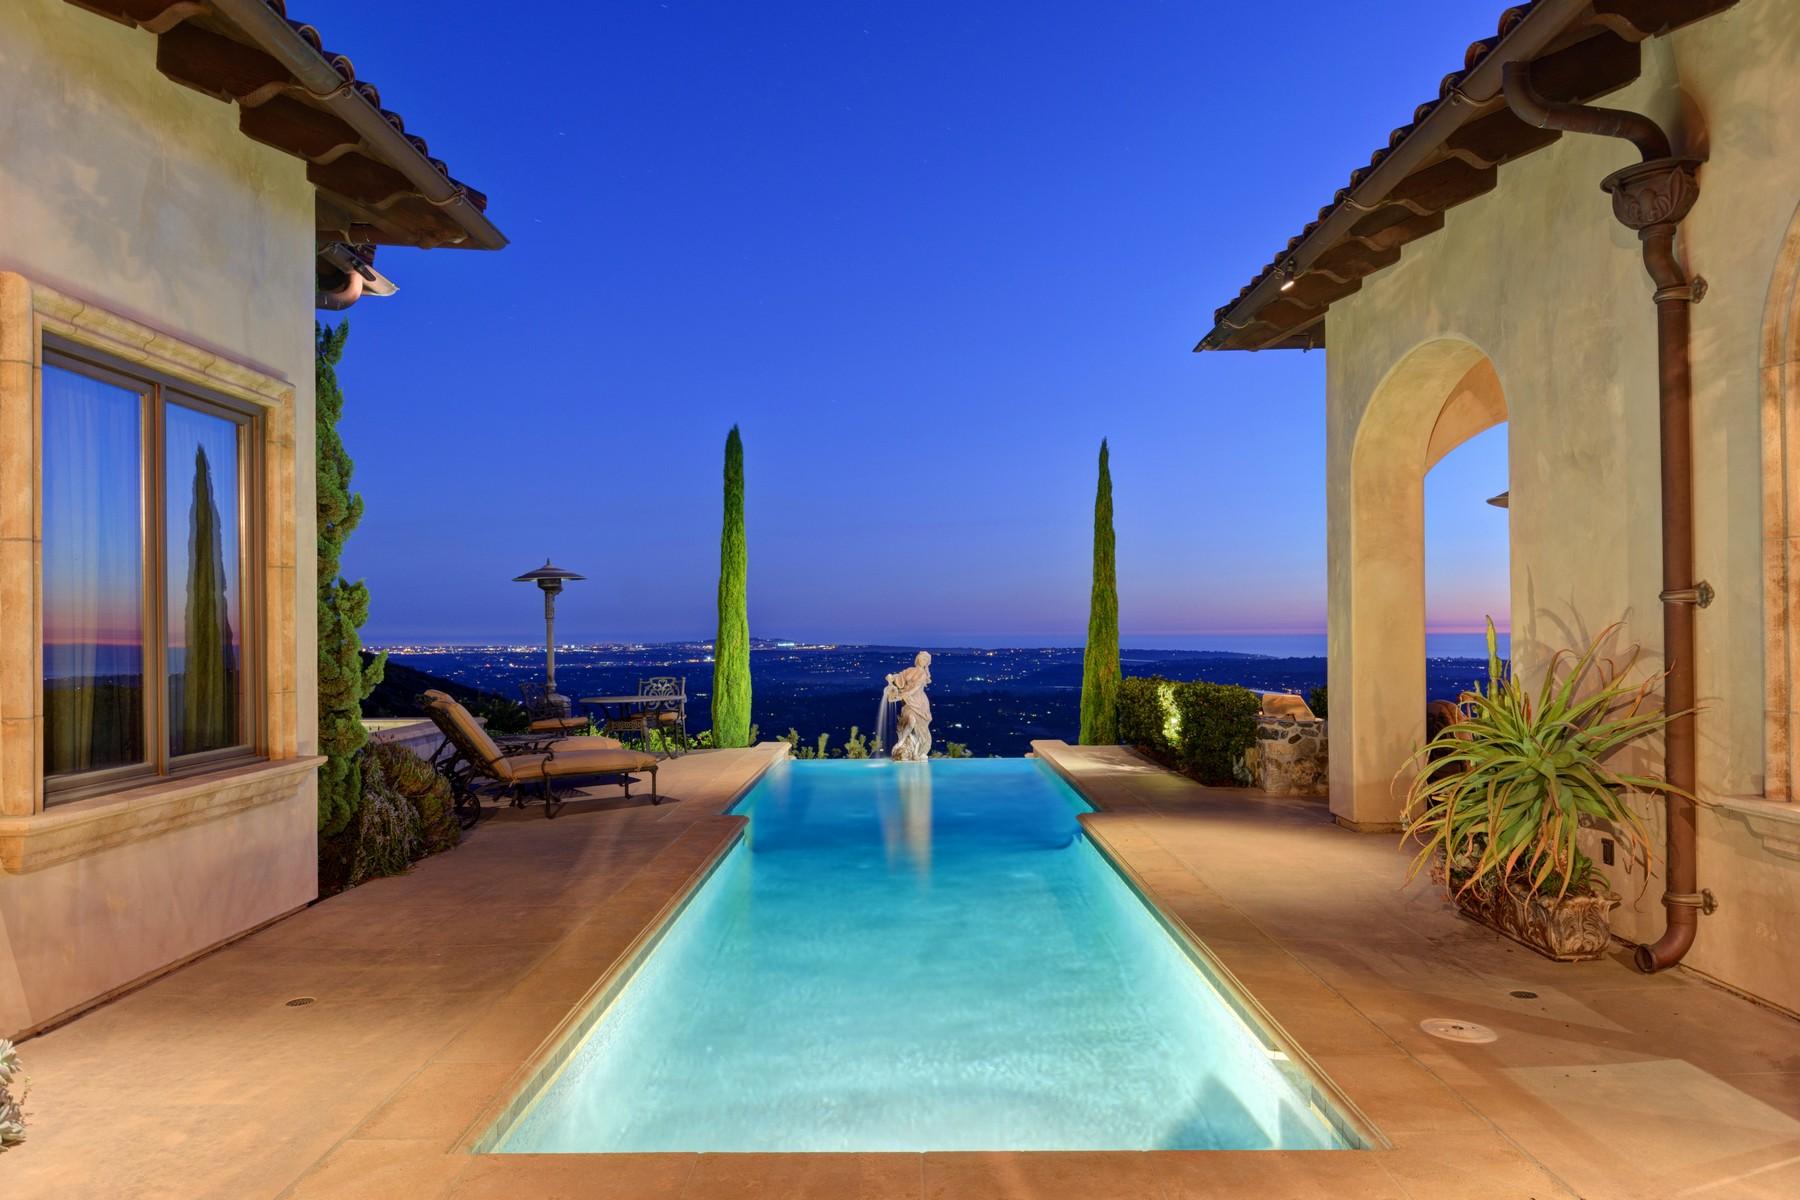 Property For Sale at 7811 Camino De Arriba